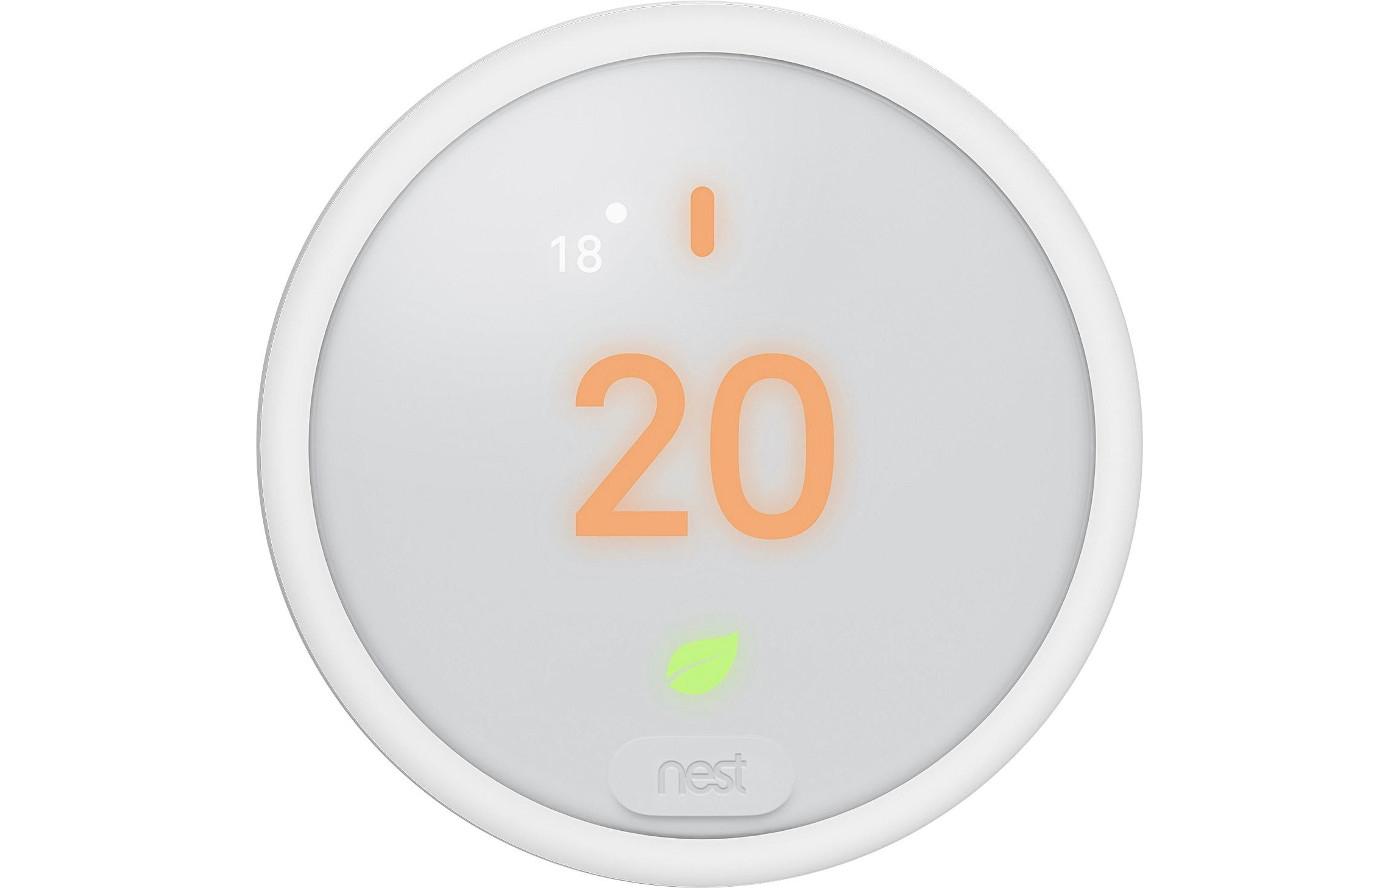 Cheaper Nest Thermostat